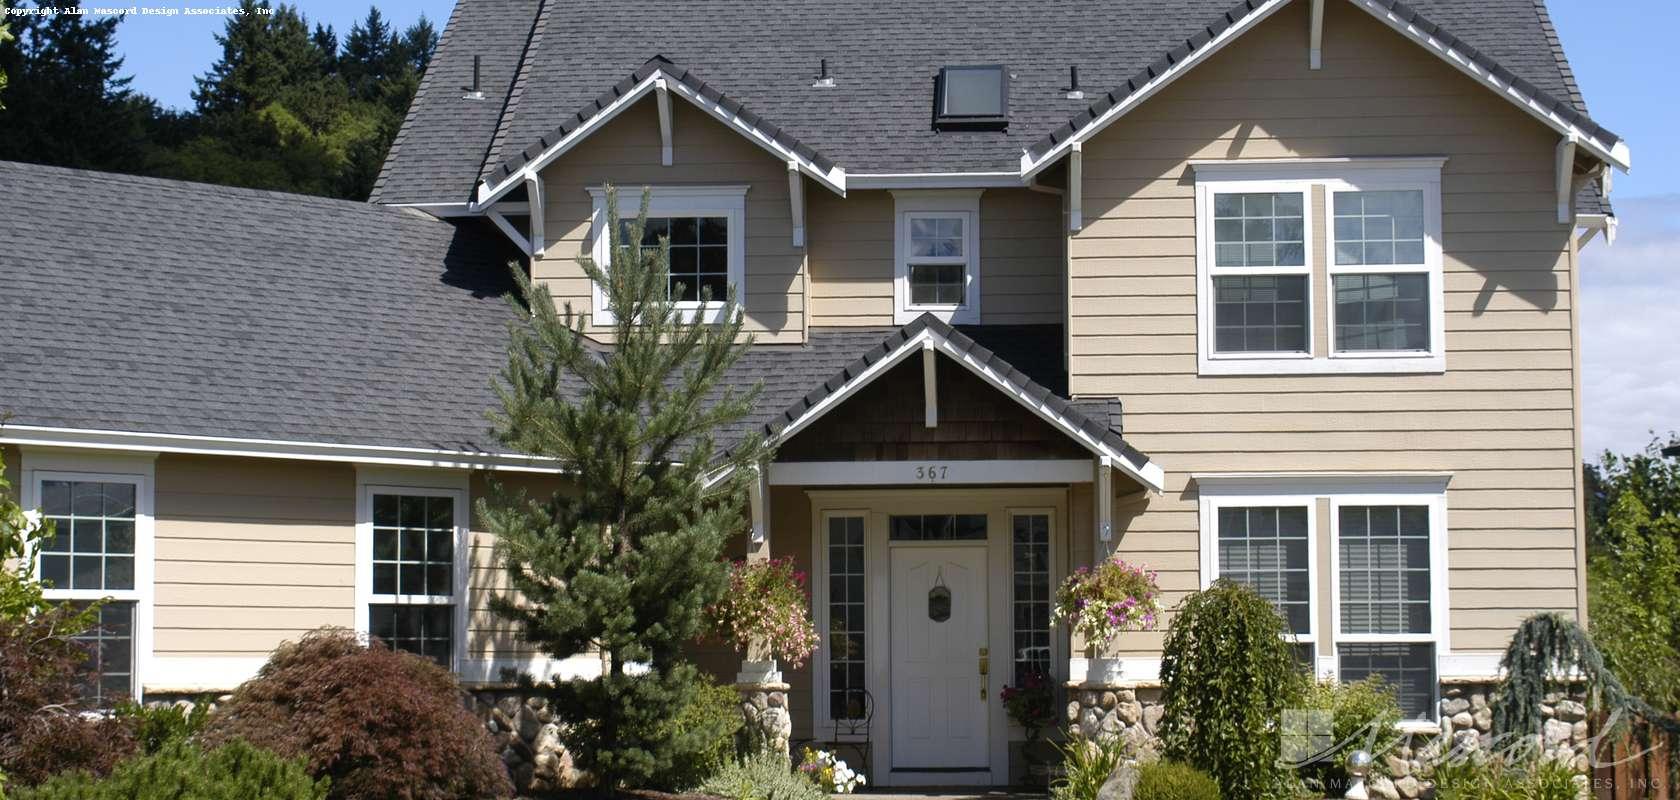 Mascord House Plan 2293: The Seguard